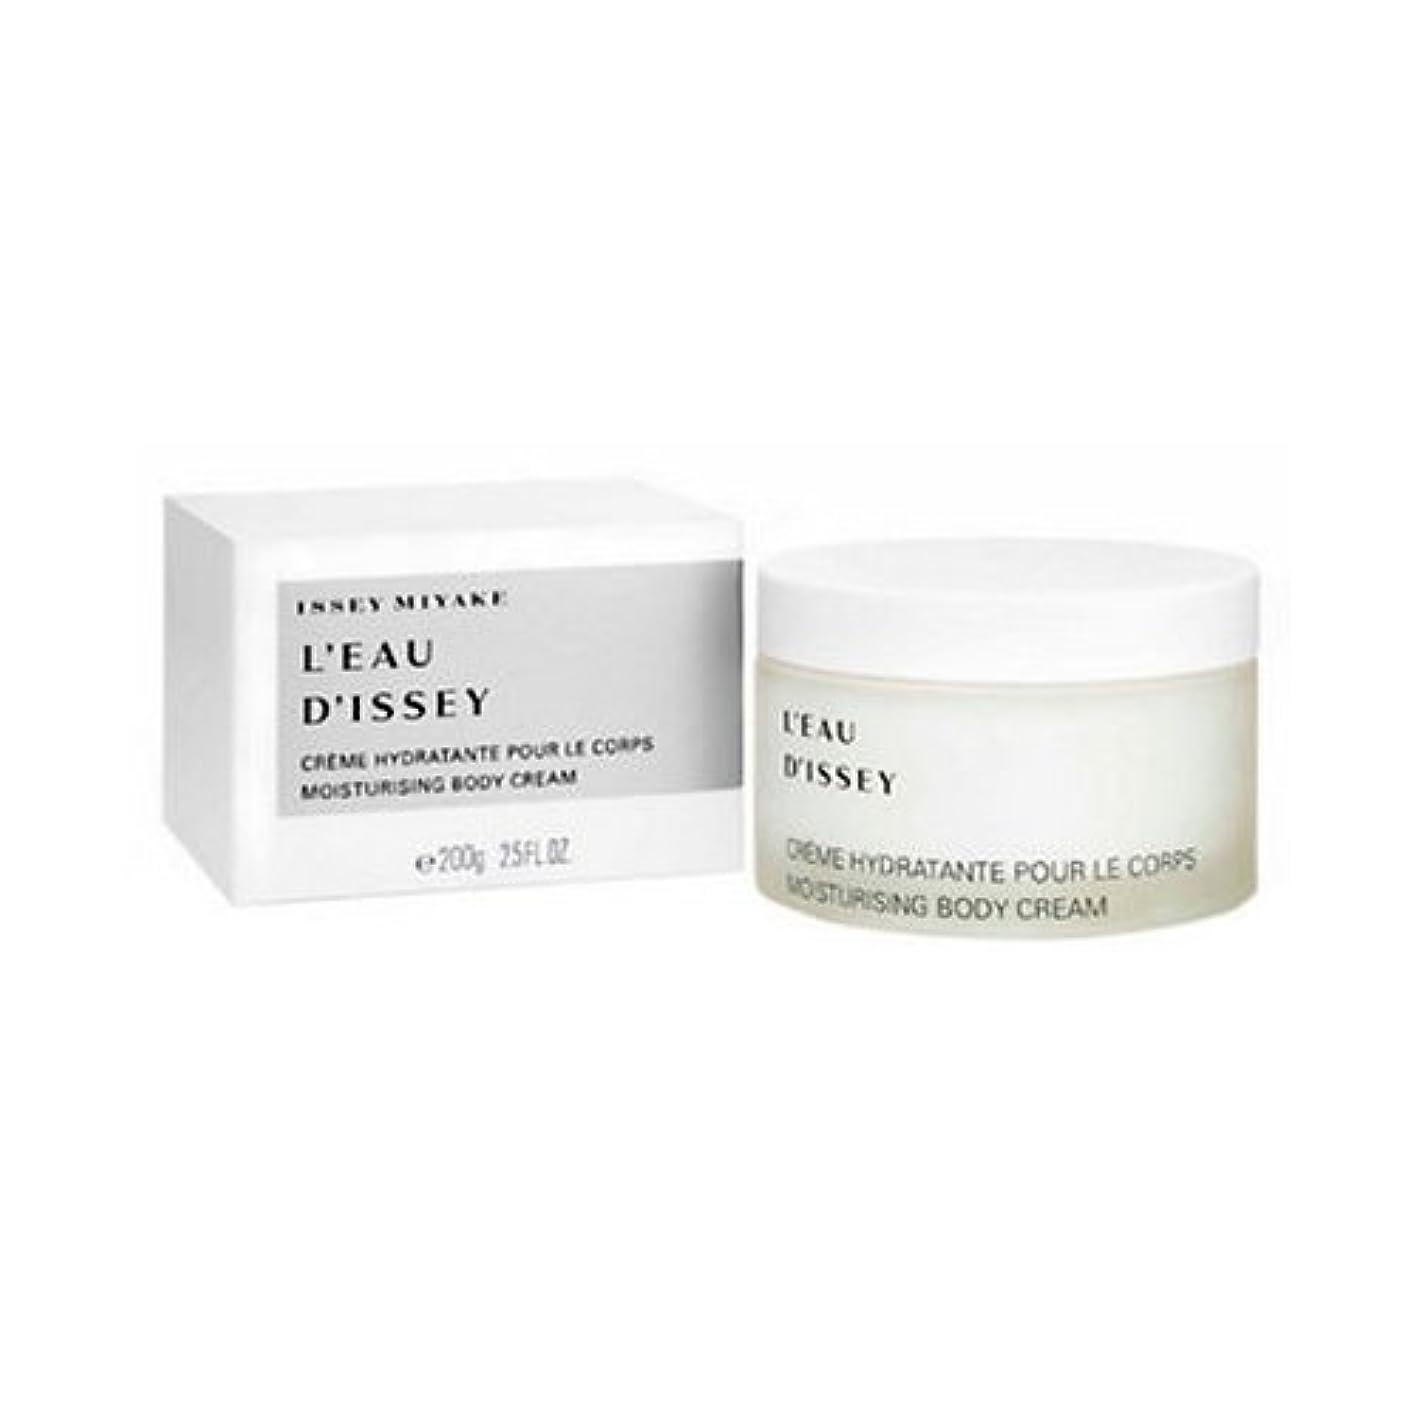 Issey Miyake L Eau D Issey Body Cream 200ml [並行輸入品]